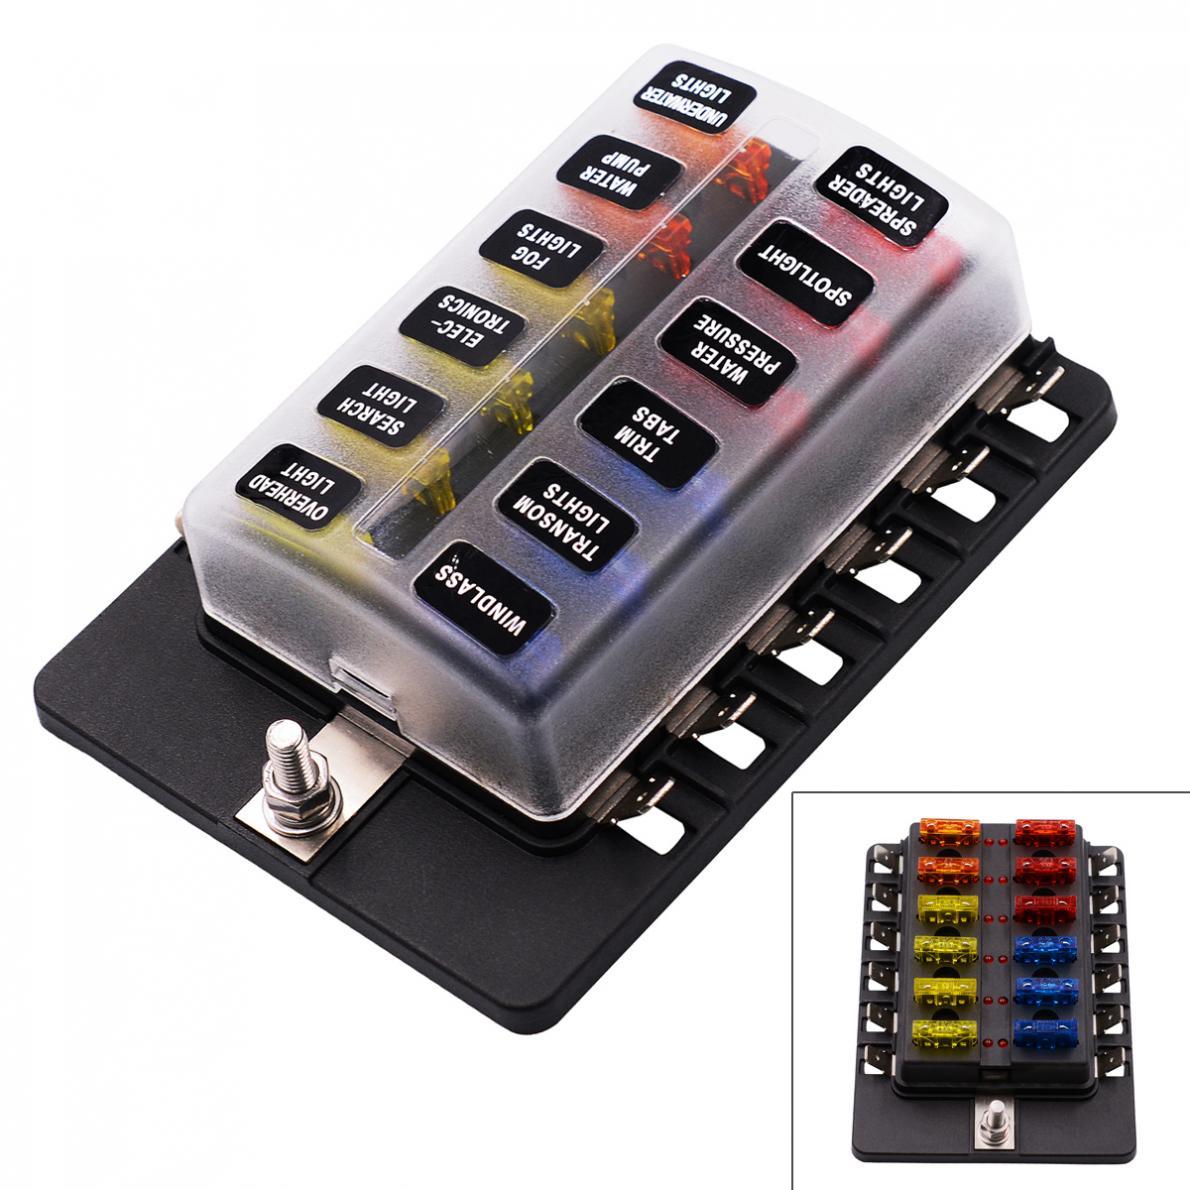 max 100a 32v plastic cover 12 way blade fuse box holder m5. Black Bedroom Furniture Sets. Home Design Ideas